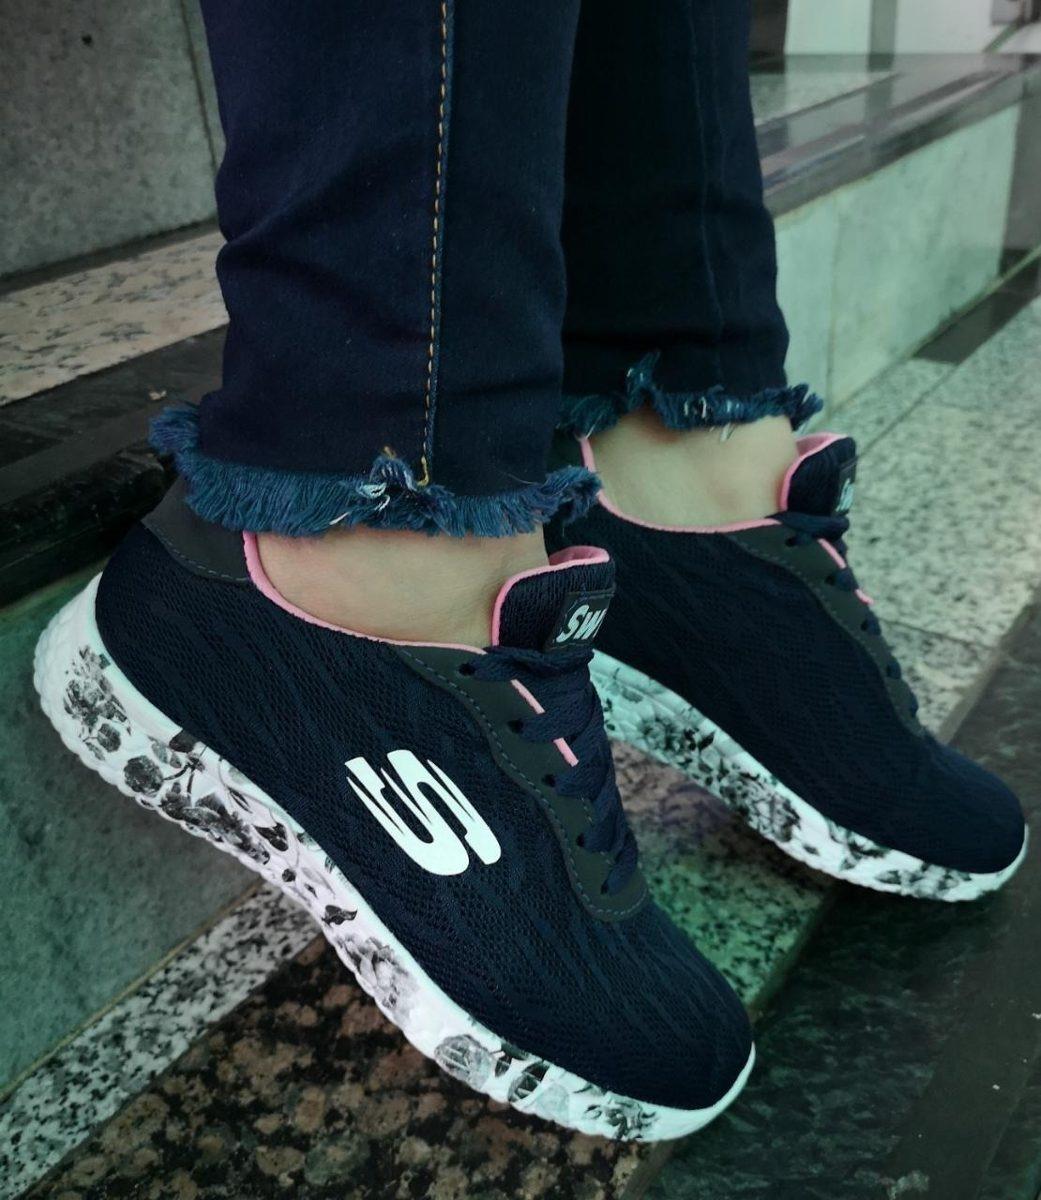 Skechers Microburst One Up Black Fashionmodelo